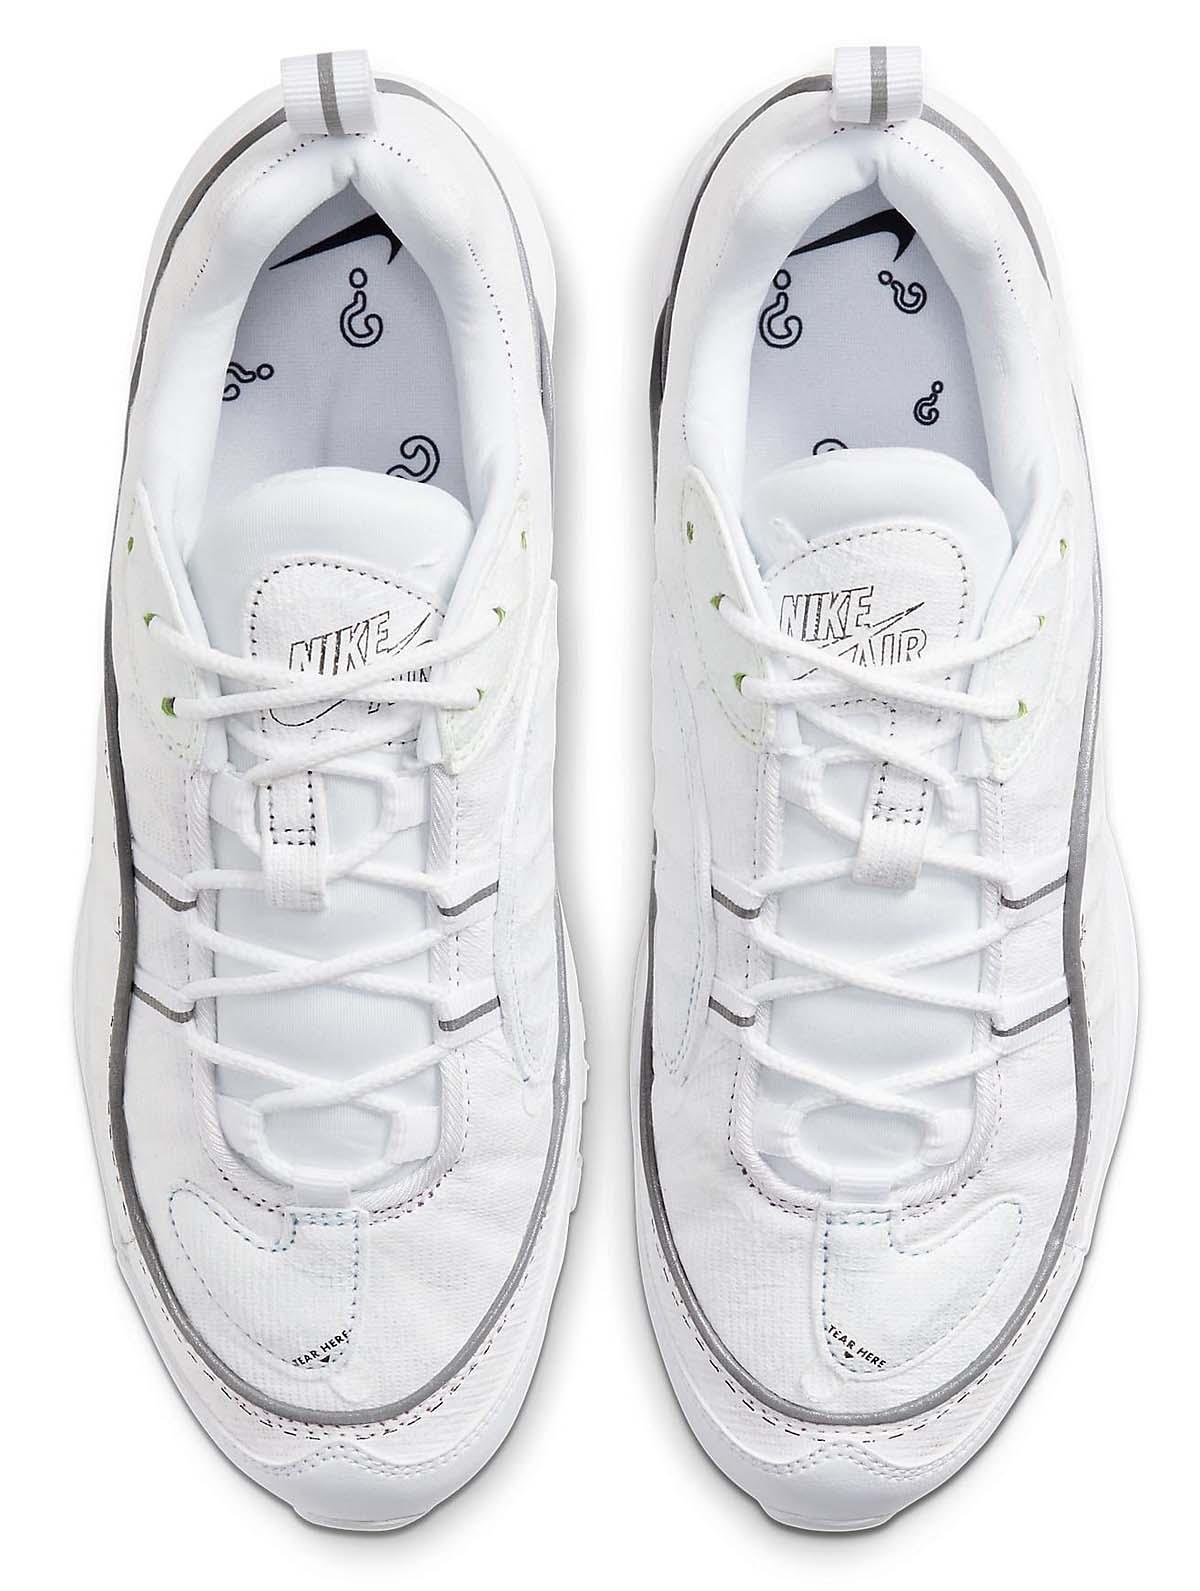 NIKE AIR MAX 98 LX REVEAL WHITE / WHITE-MULTI COLOR CJ0634-101 ナイキ エアマックス98 LX リベル ホワイト/マルチカラー